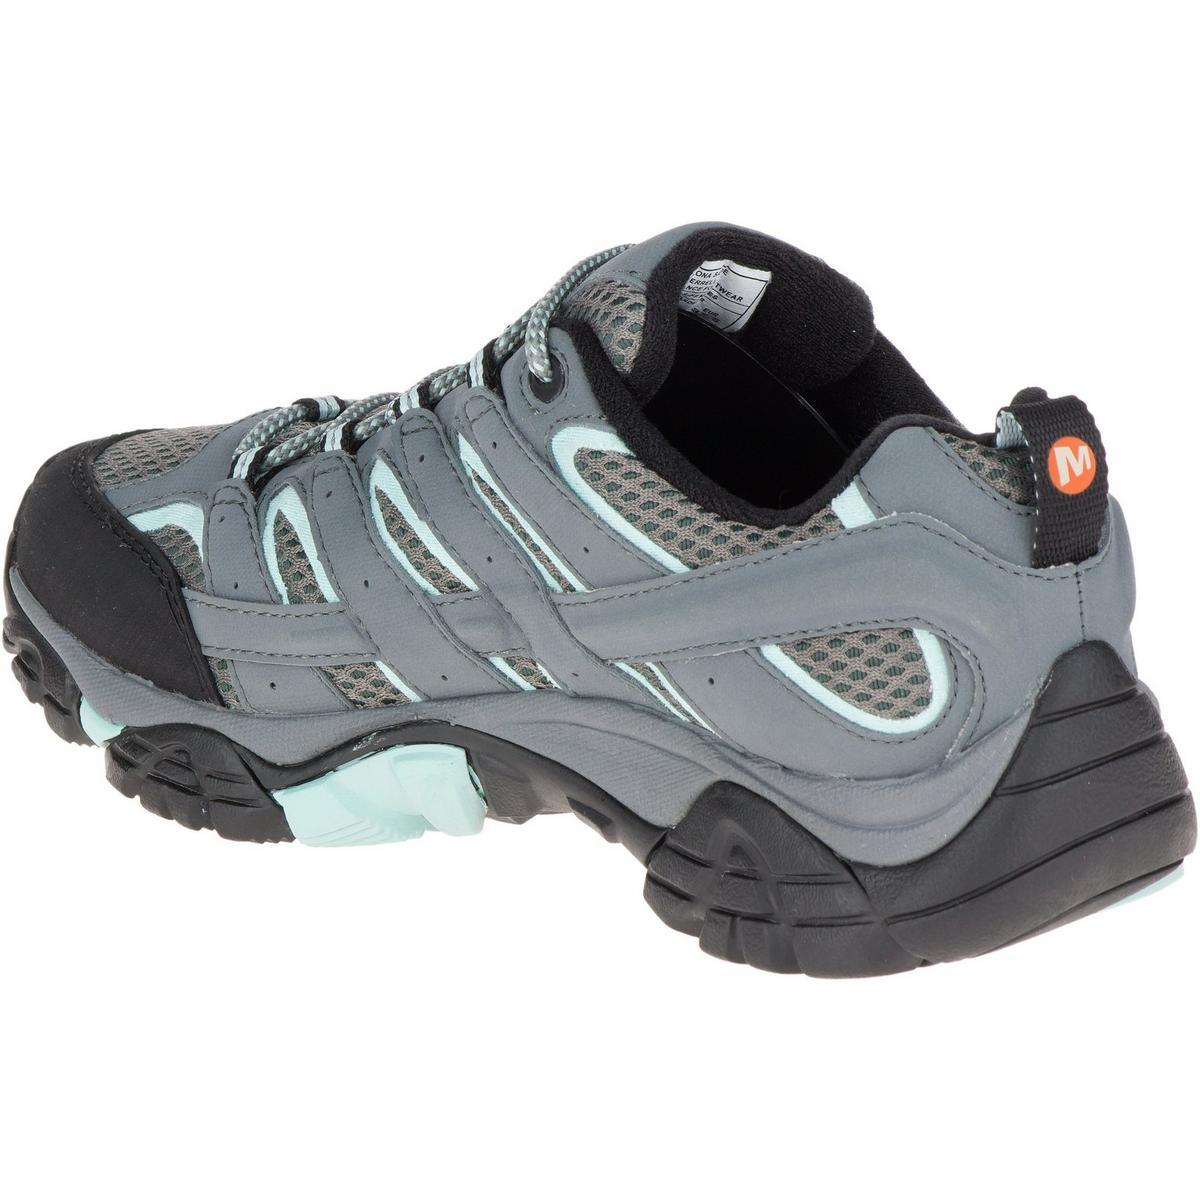 Merrell Women's Moab 2 GORE-TEX® Shoe - Half Sizes Approach Shoe